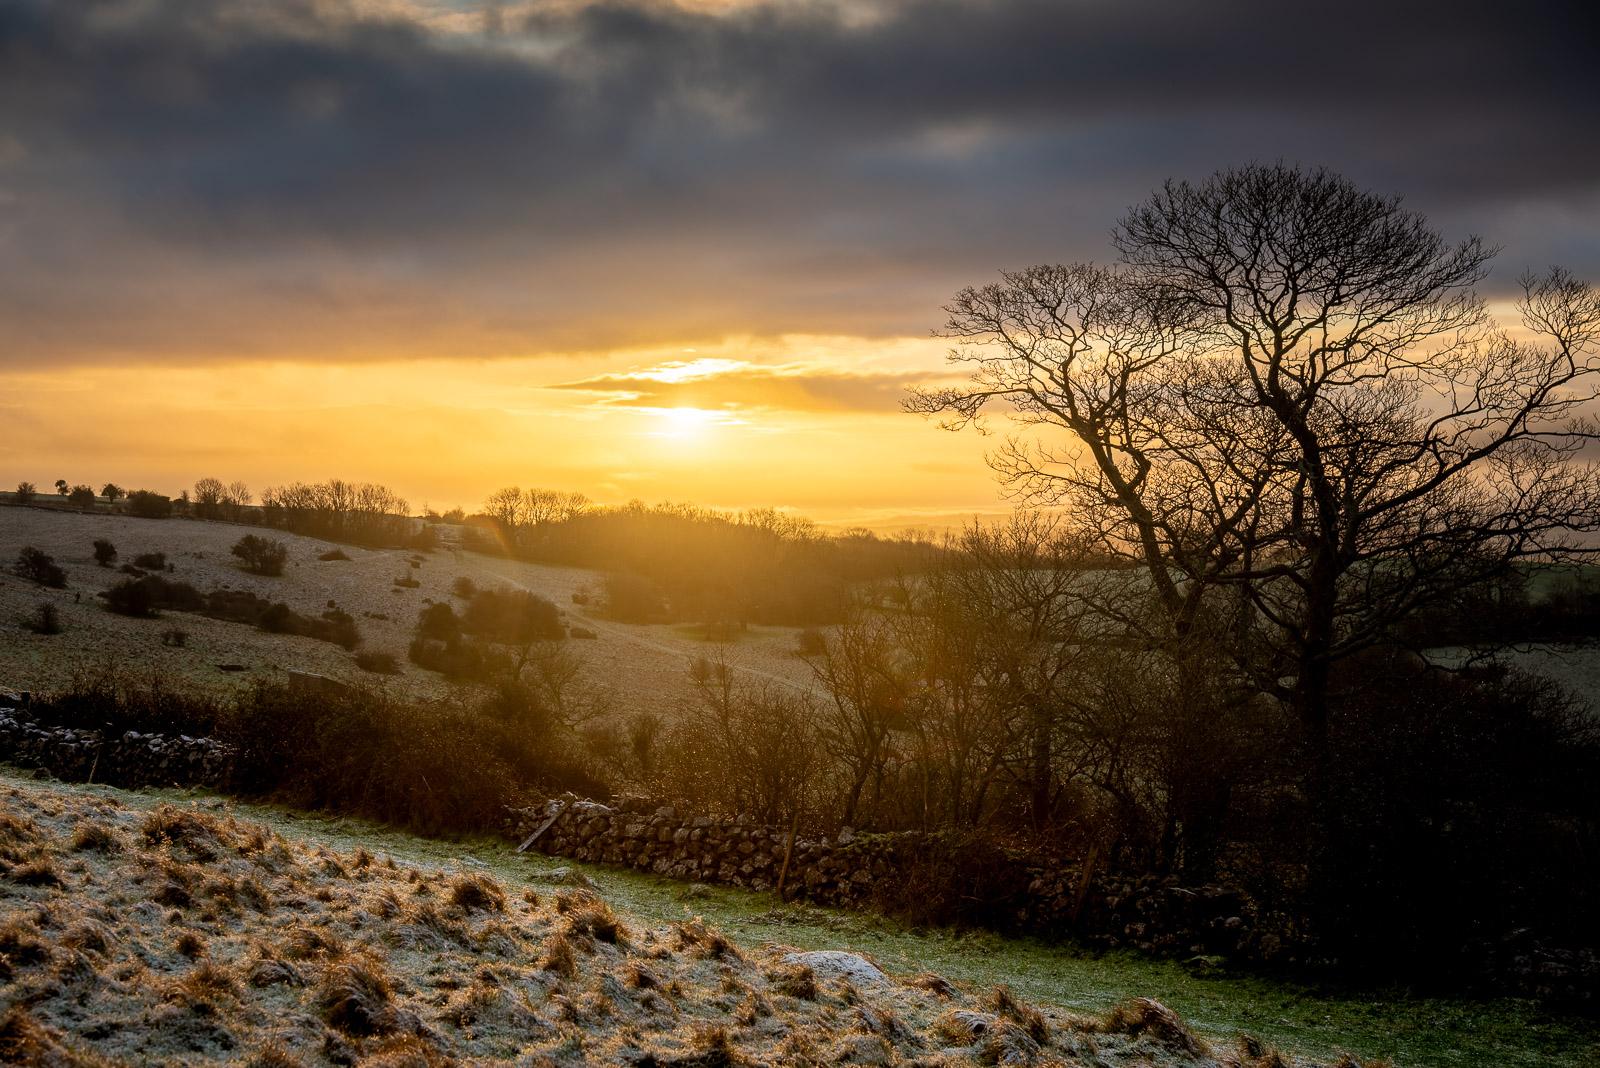 Winter Sunrise at Lynchcombe - From Cooks Fields, Mendip Hills, Somerset, UK. ID JB1_1158H